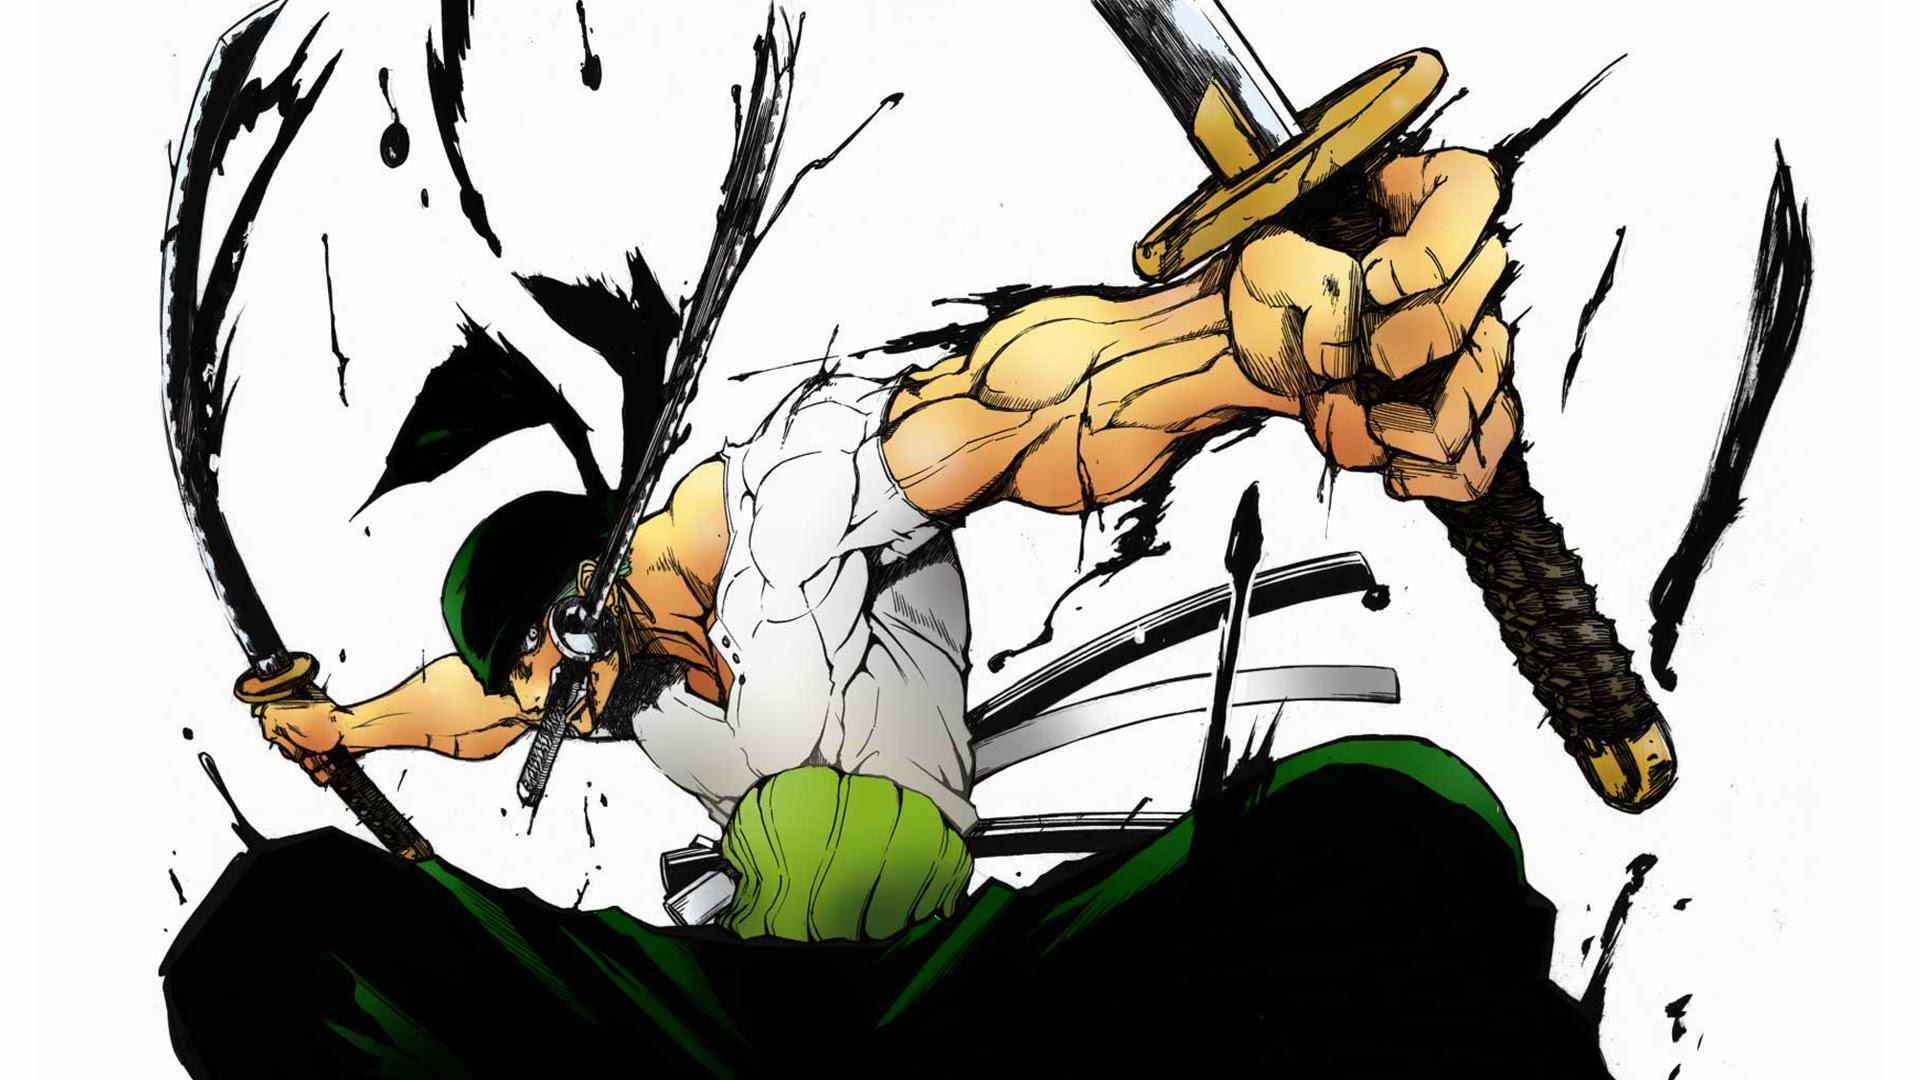 roronoa zoro 3 sword style 2u wallpaper hd